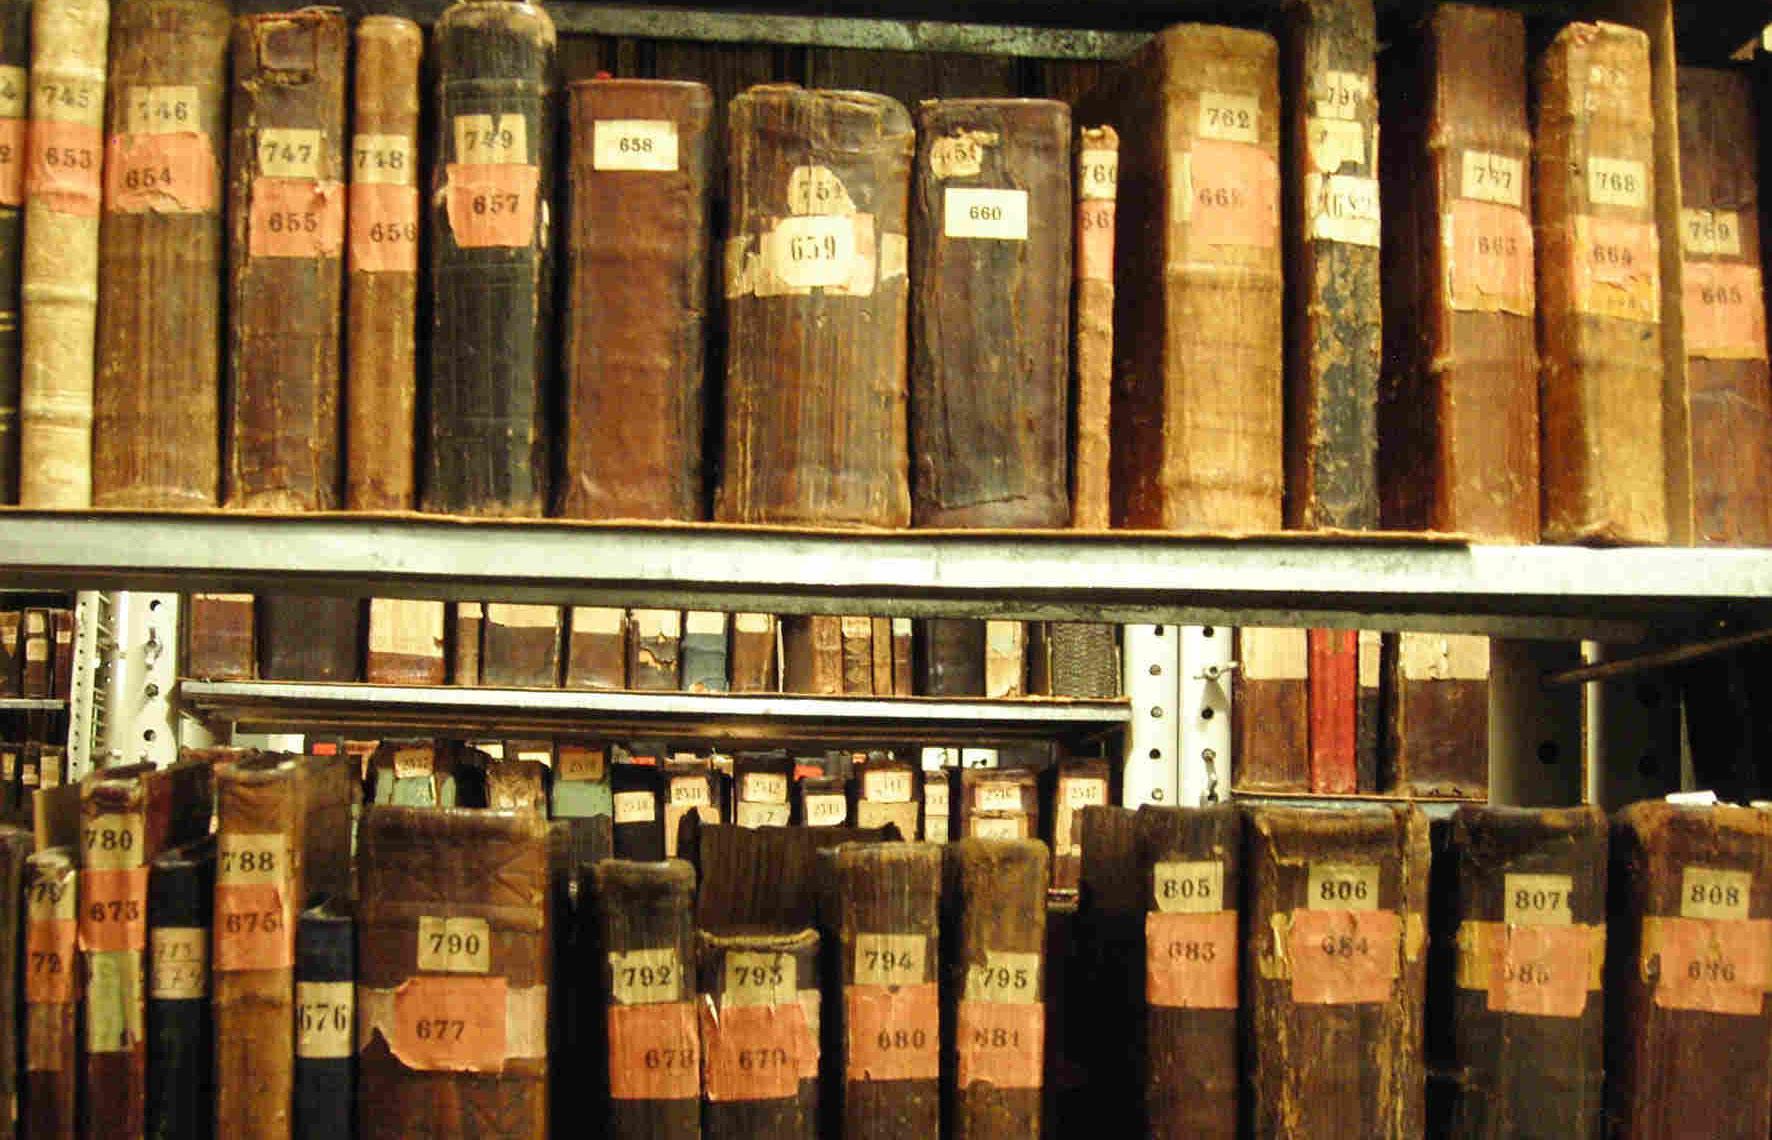 libros antiguos espana: